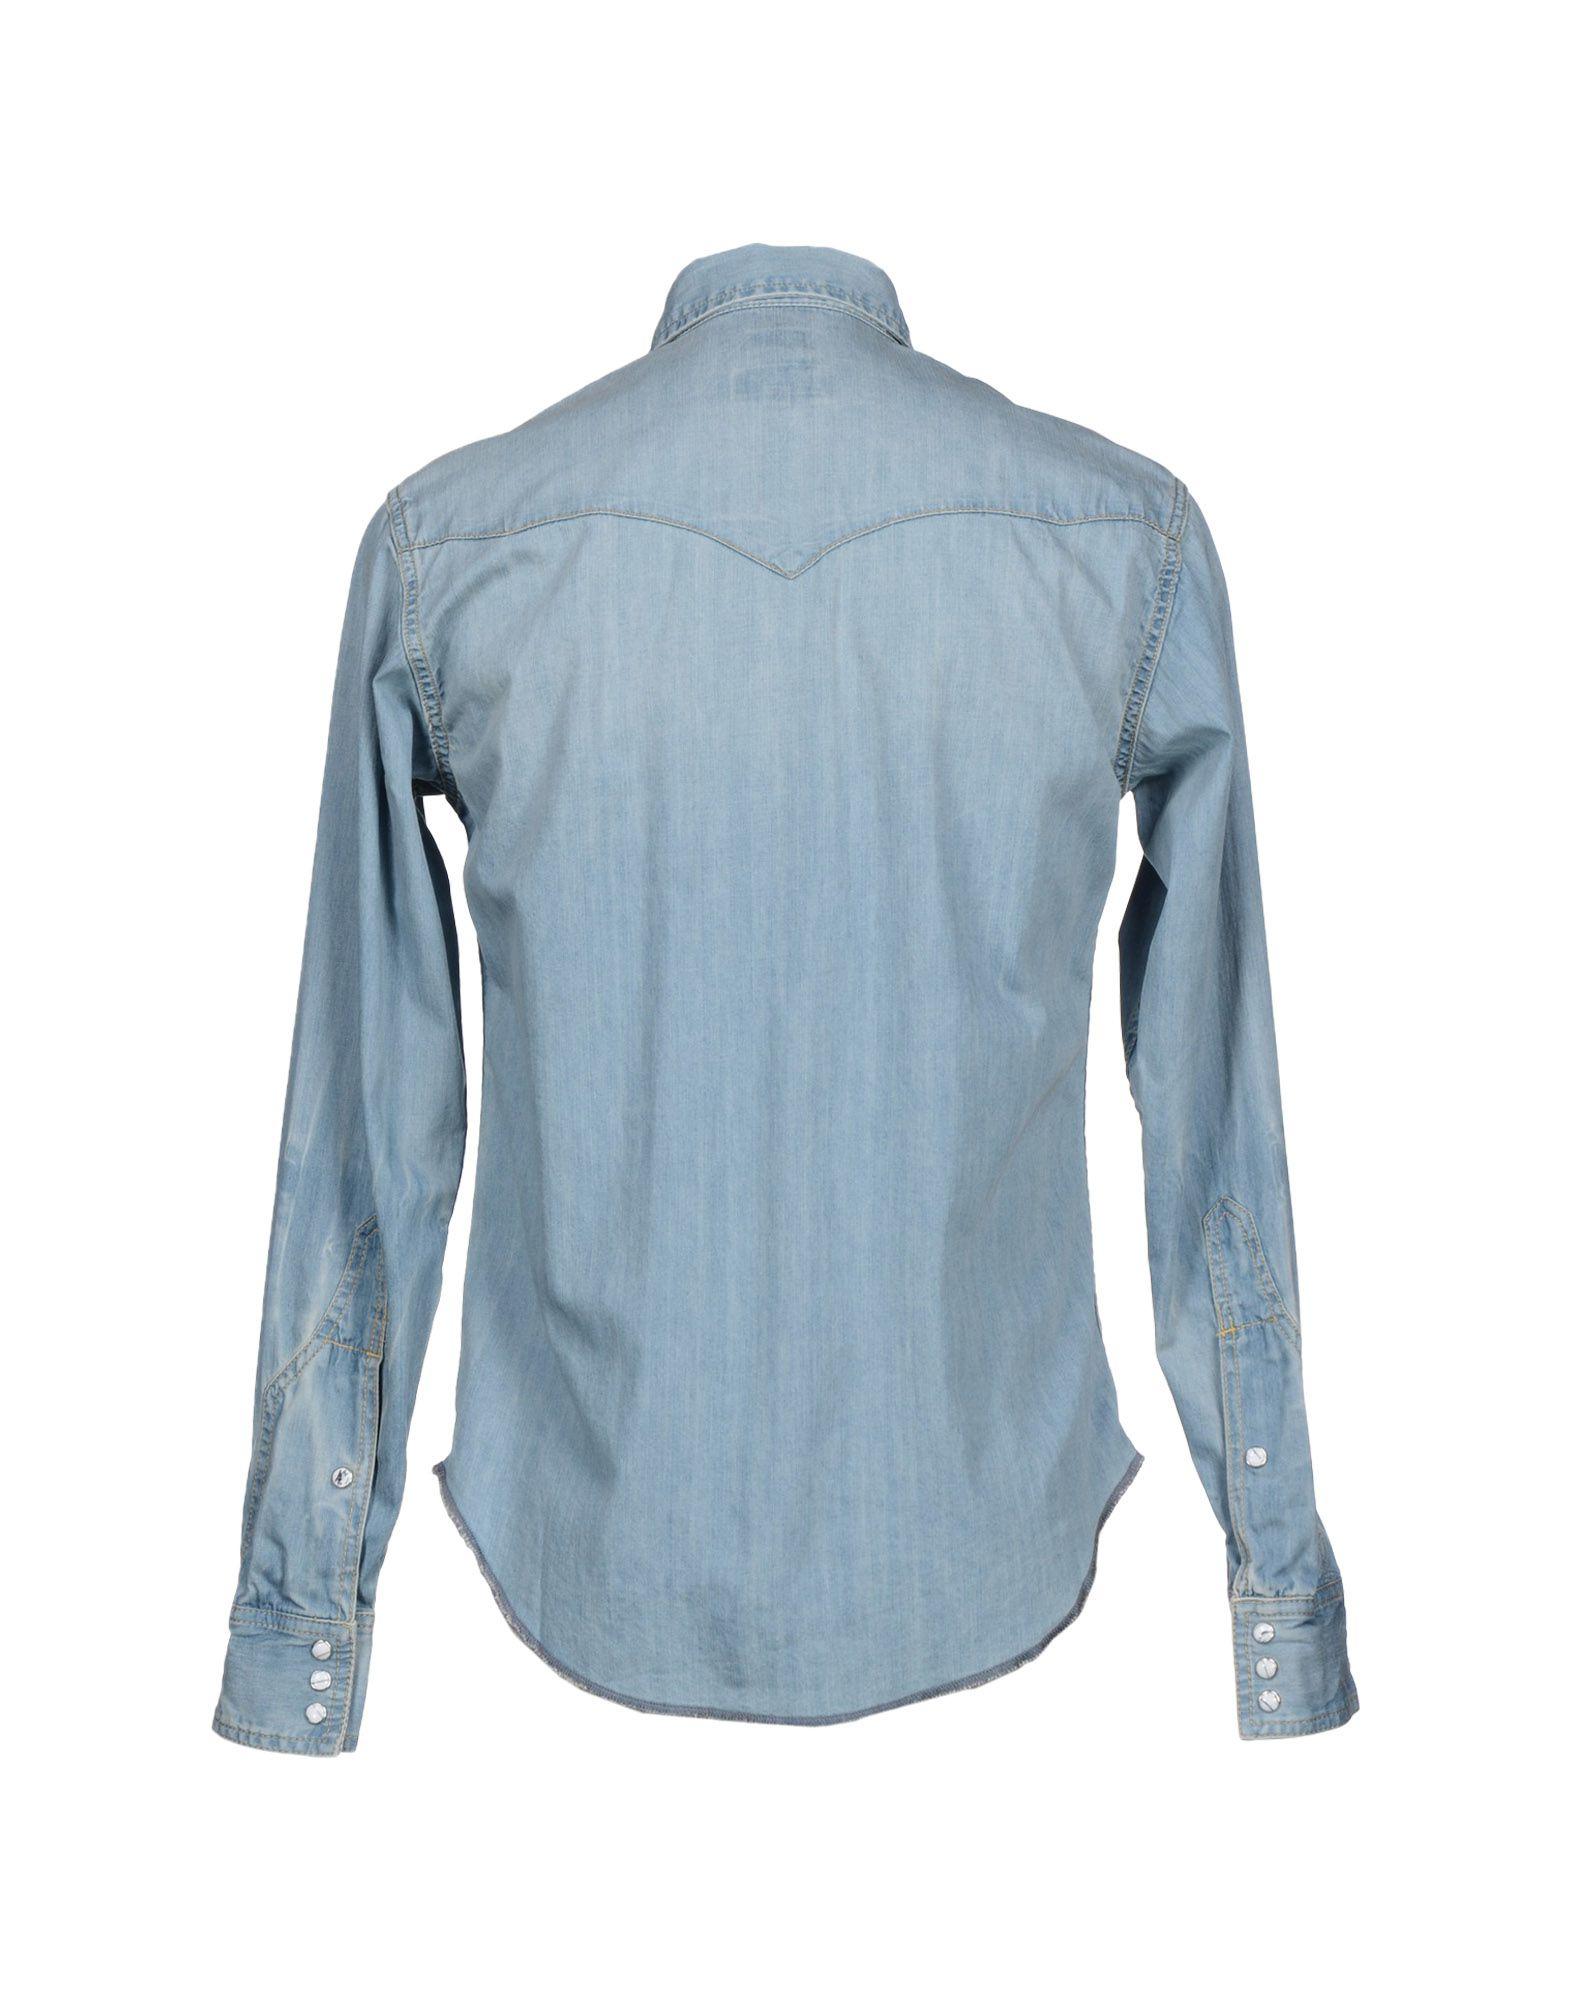 Lyst Prps Denim Shirt In Blue For Men